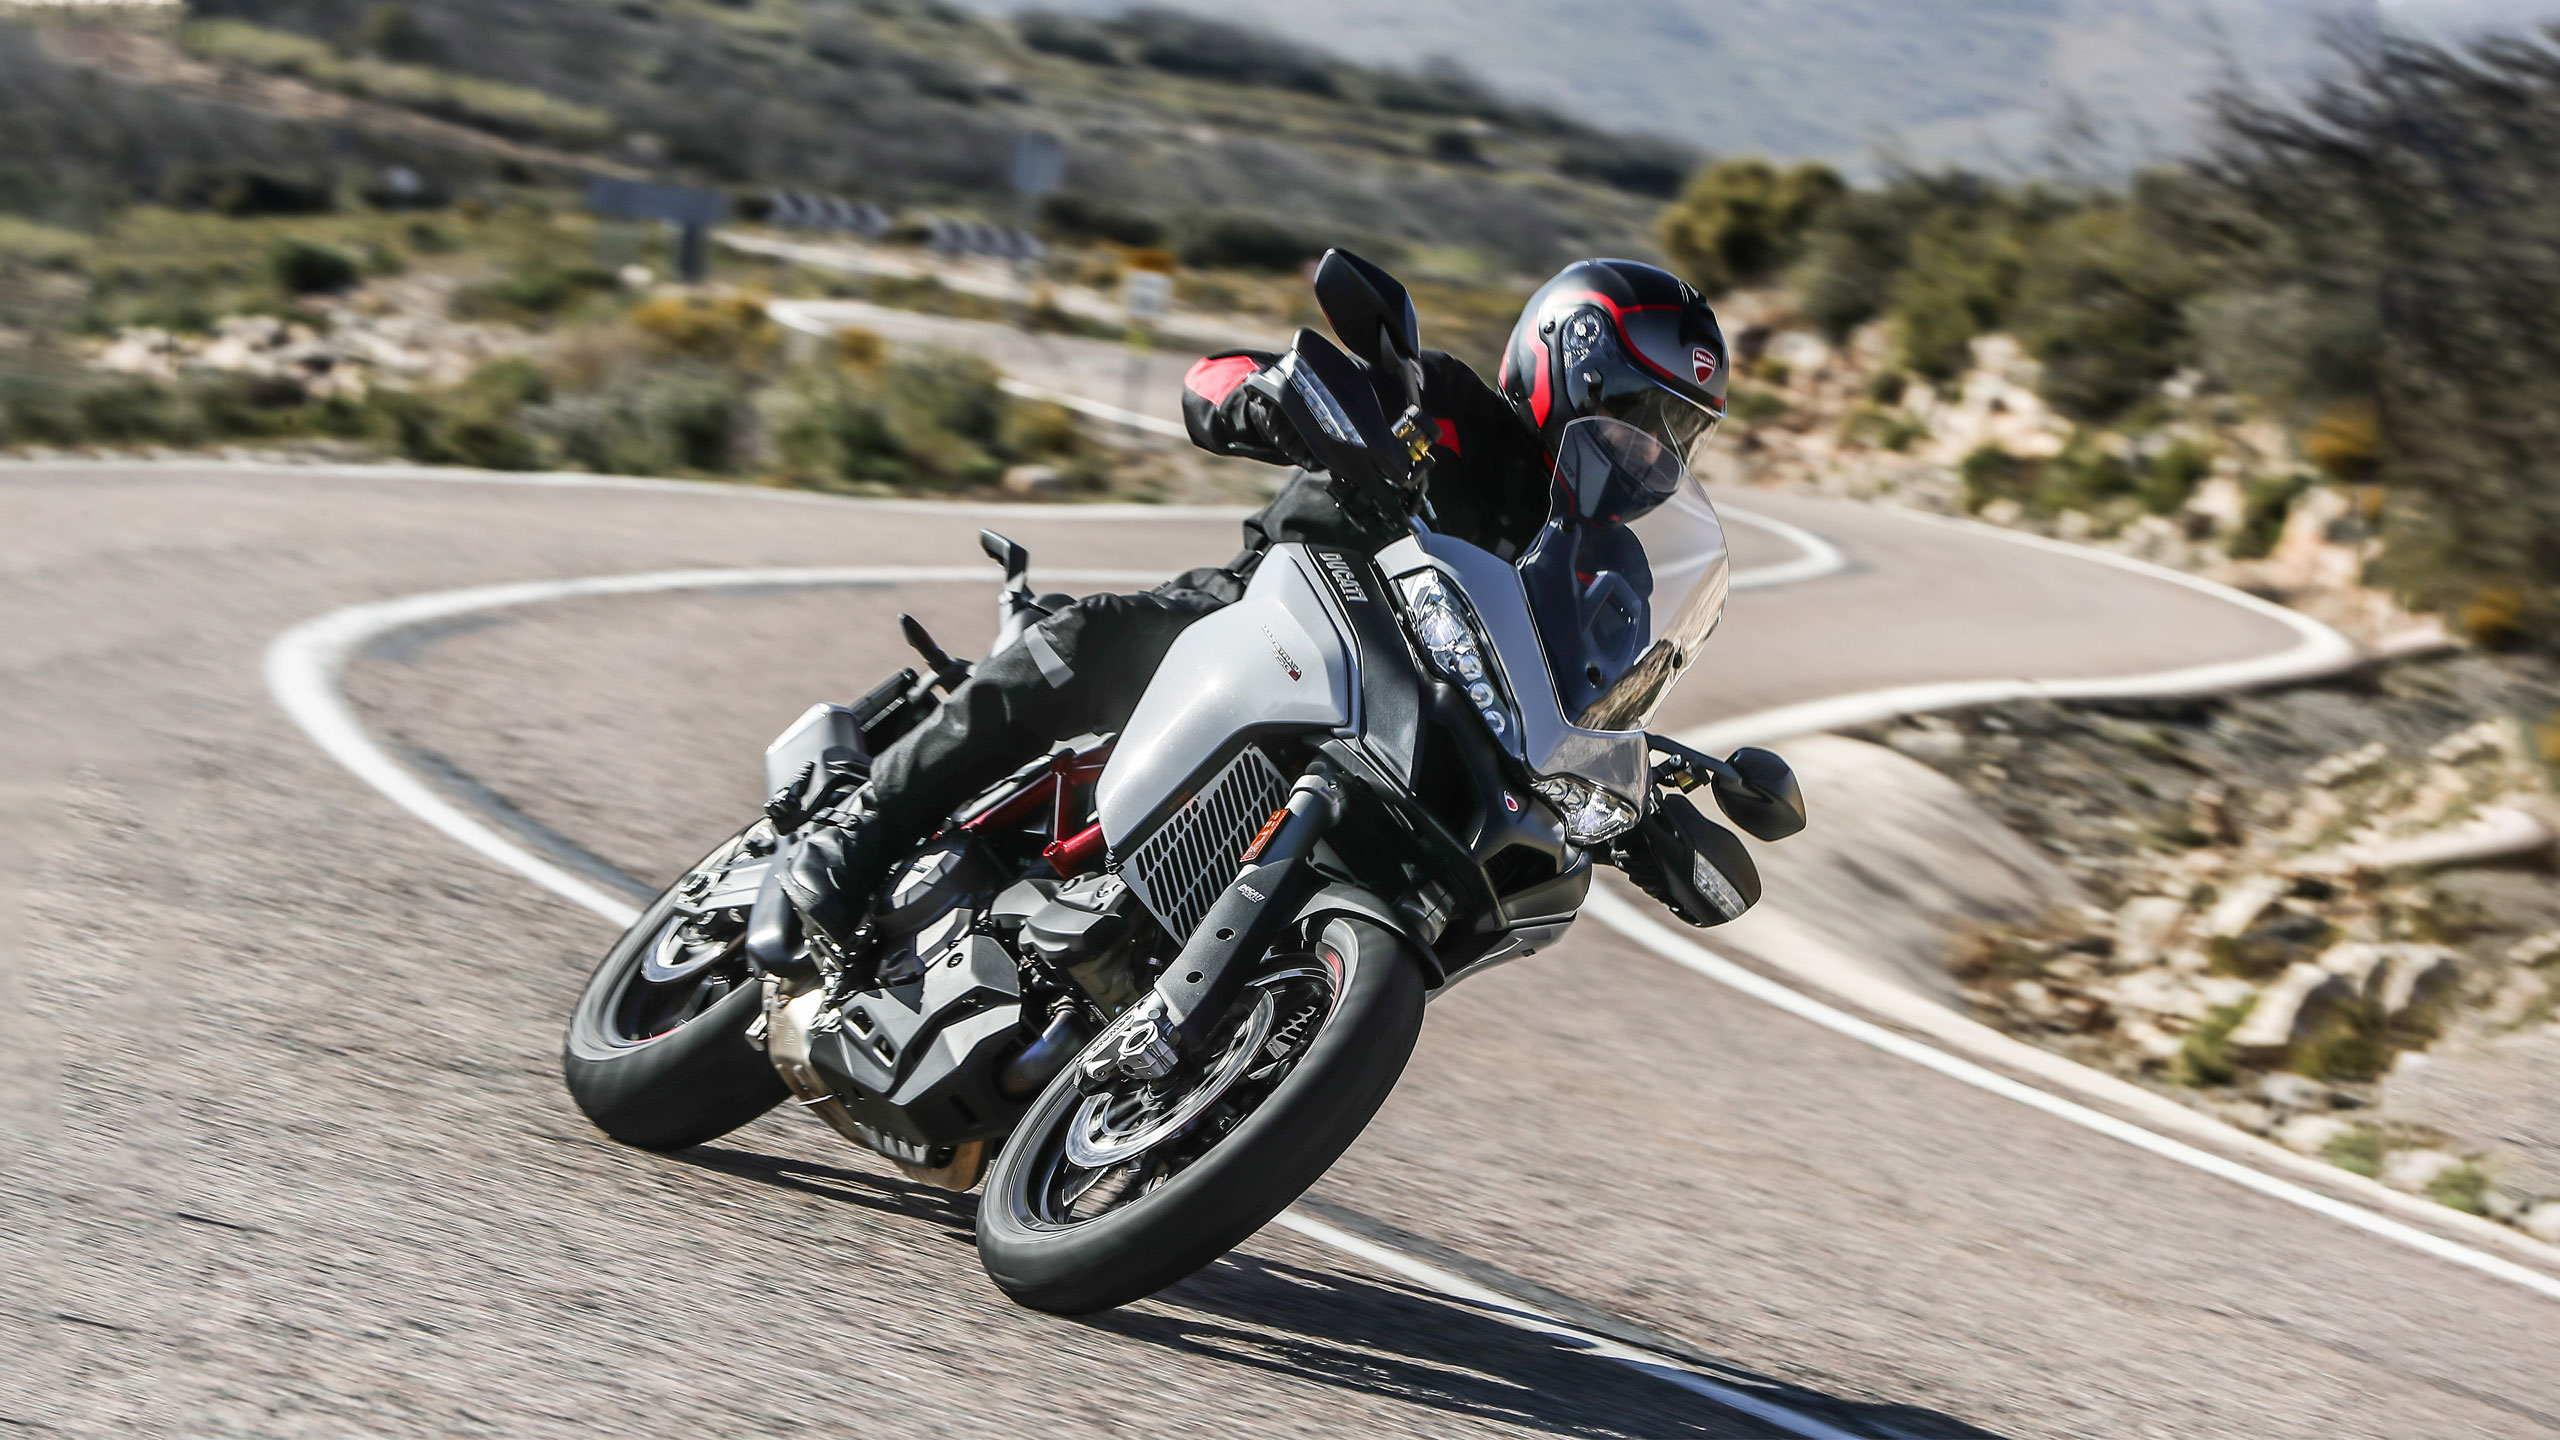 Ducati Multistrada 950 S Spoked Wheels